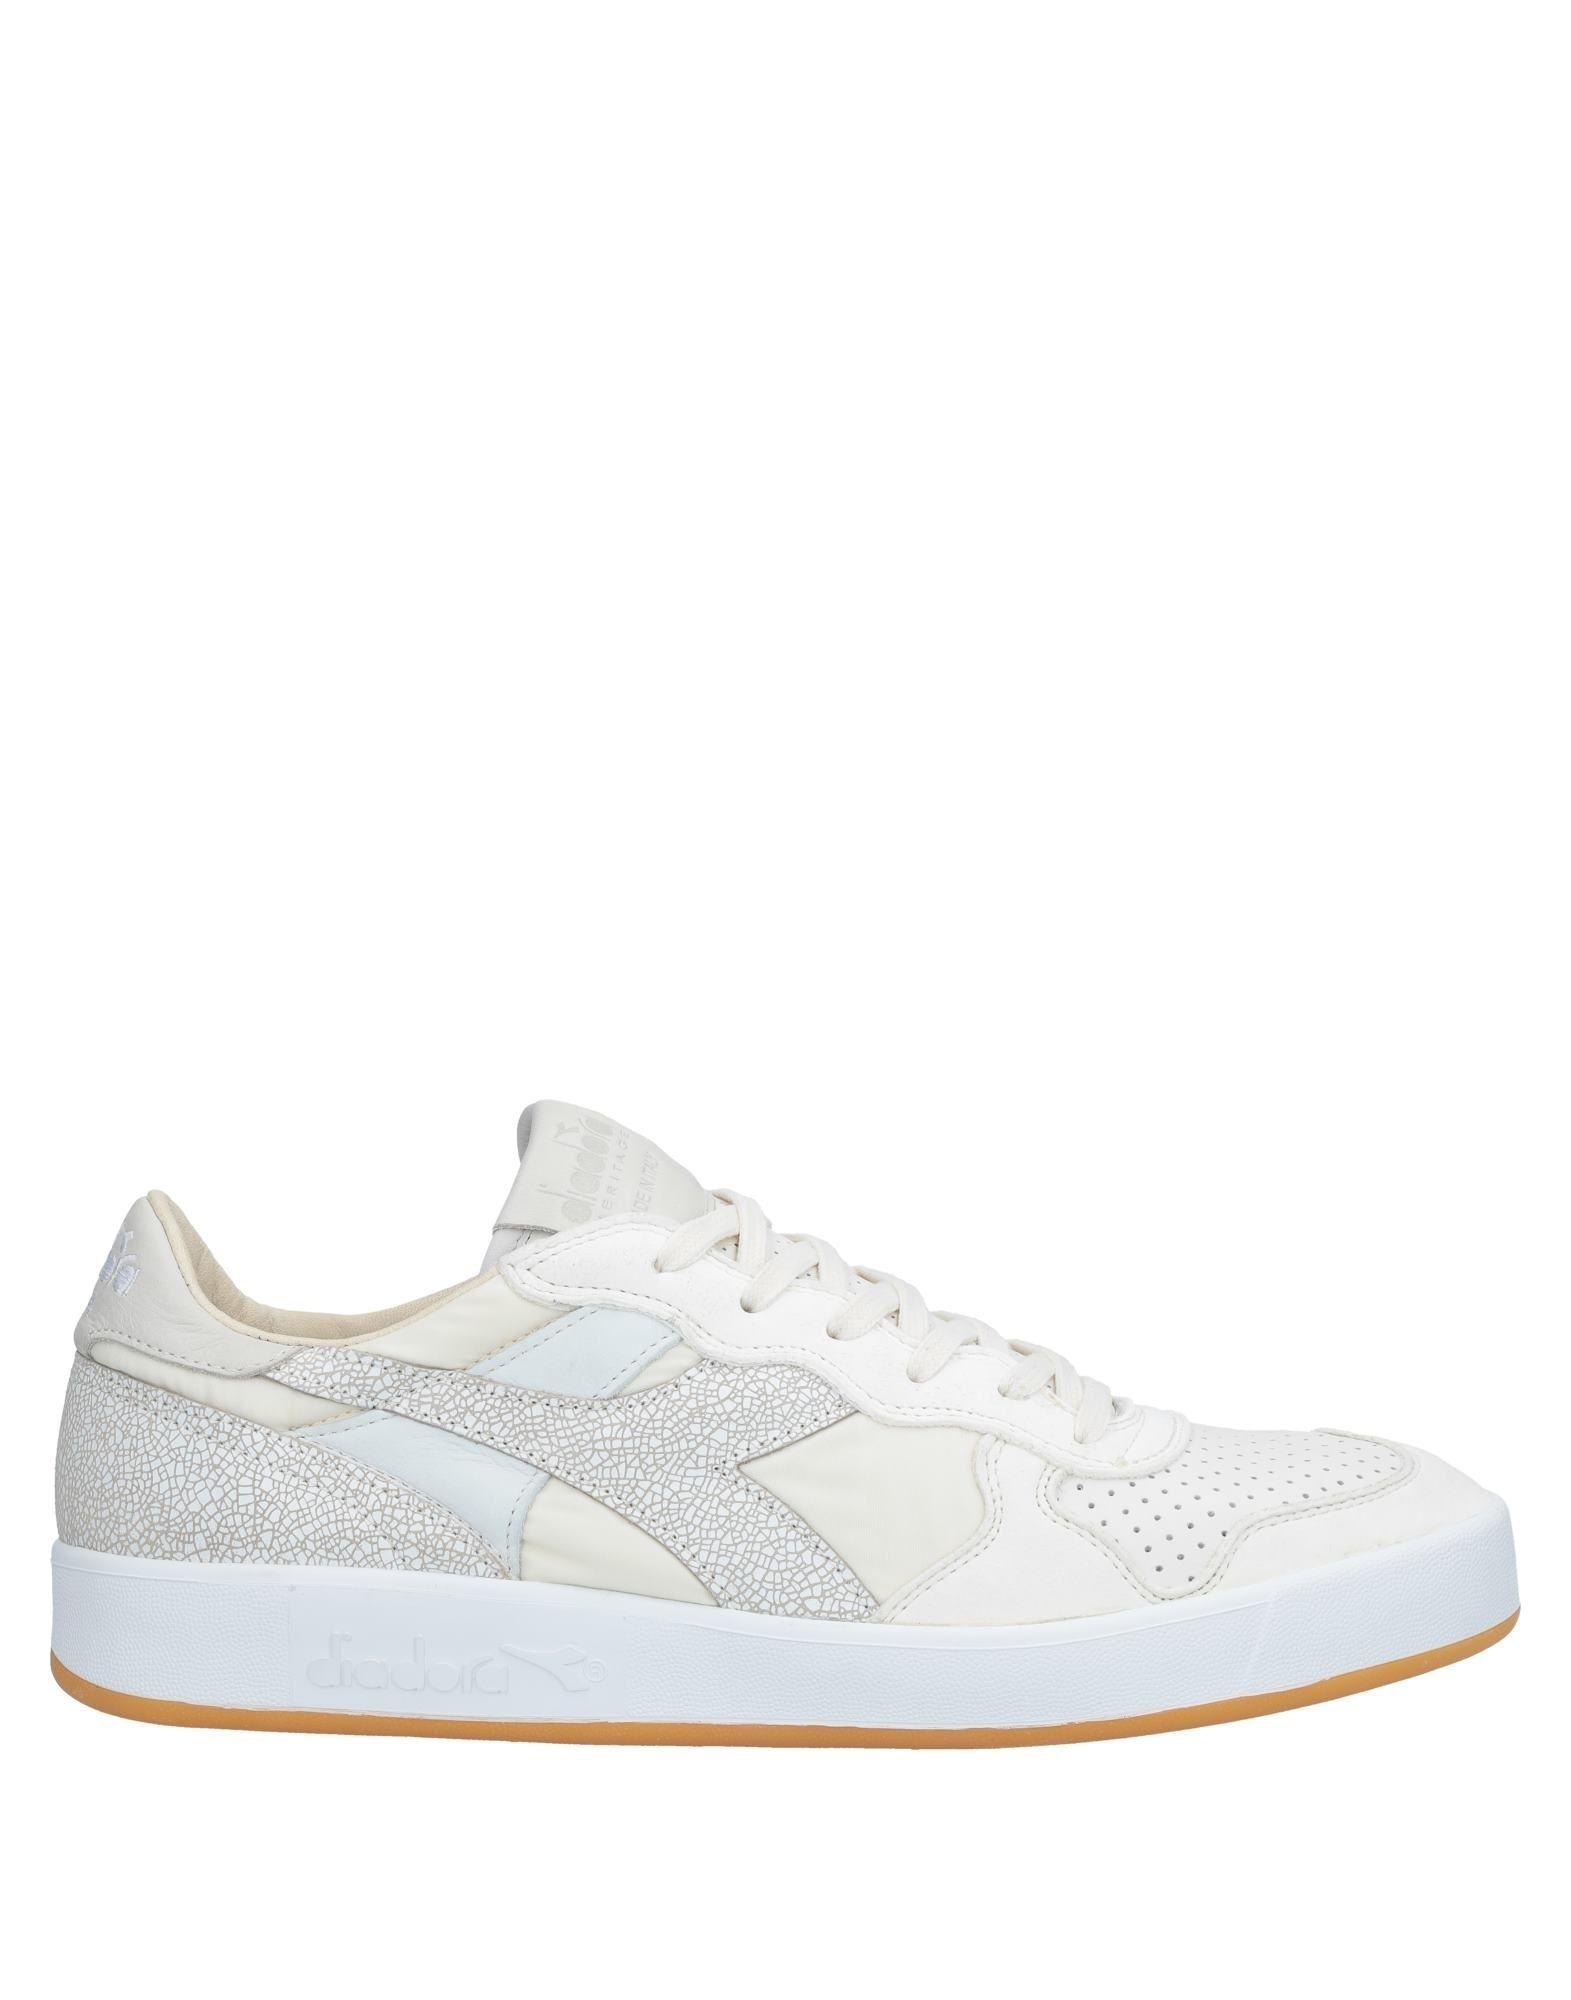 Heritage Diadora Heritage  Sneakers Herren  11536771TI 939fc1